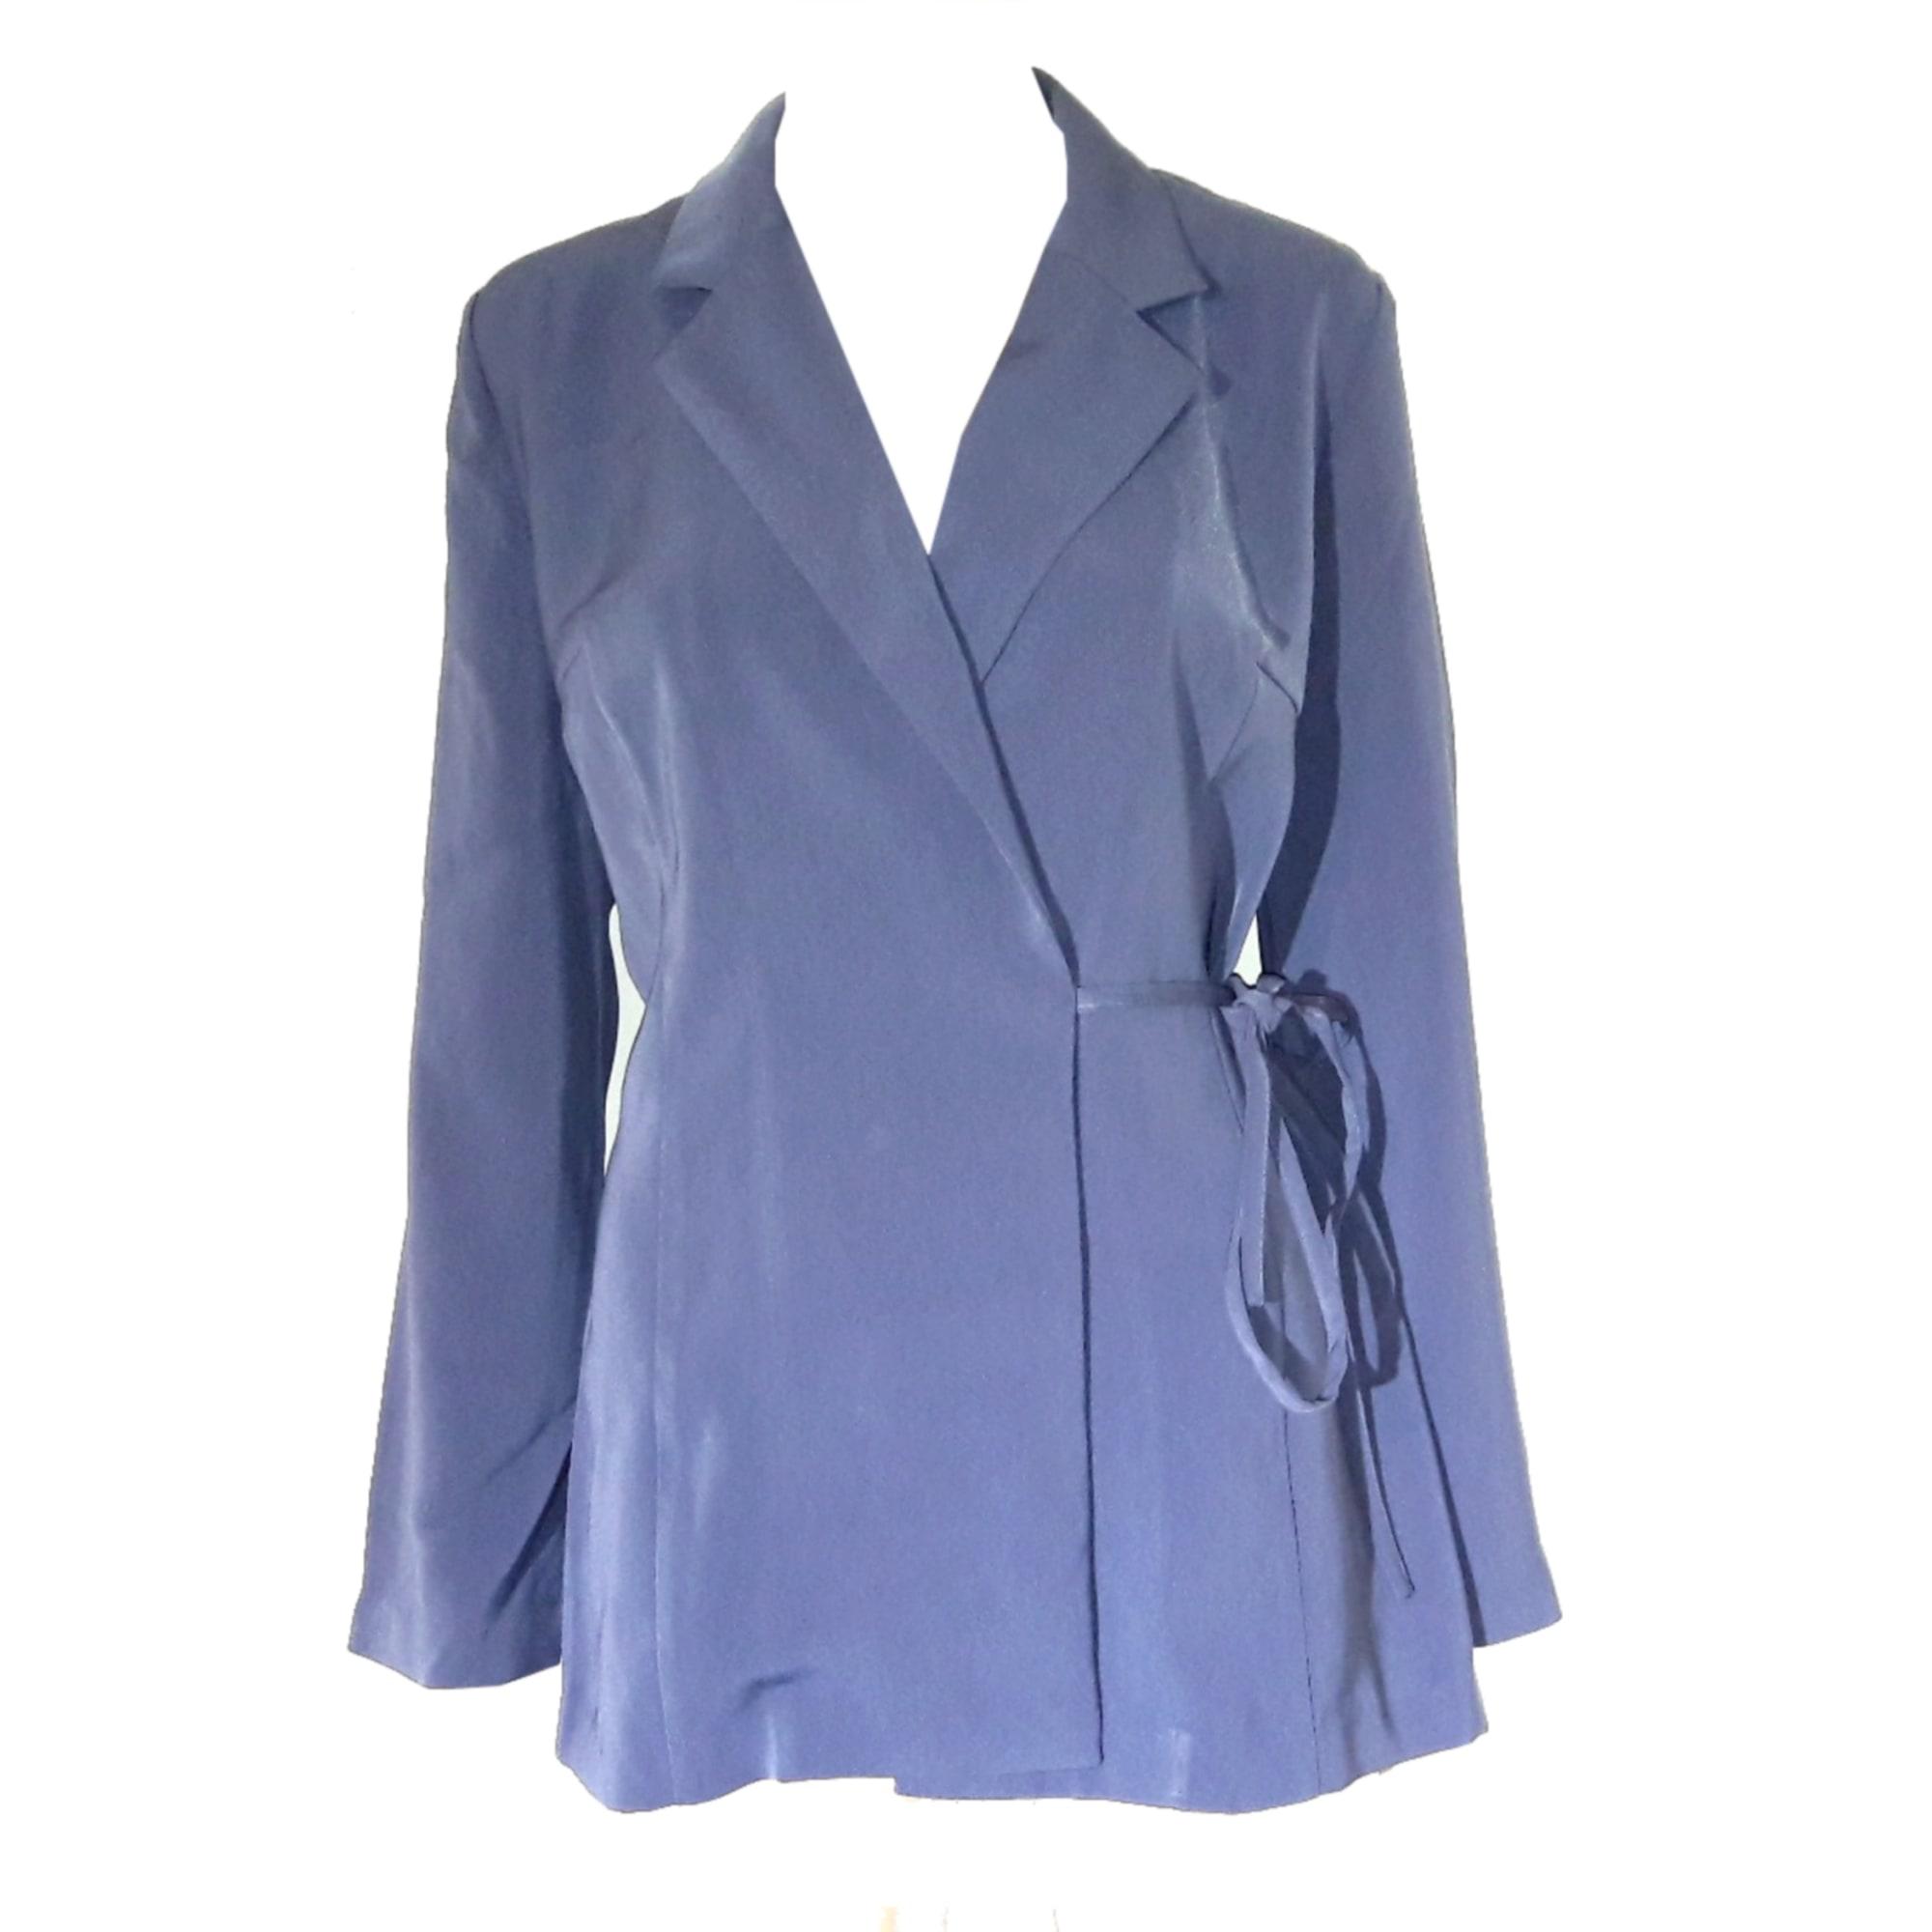 Blazer, veste tailleur CAROLL Bleu, bleu marine, bleu turquoise e1d203f4c82a